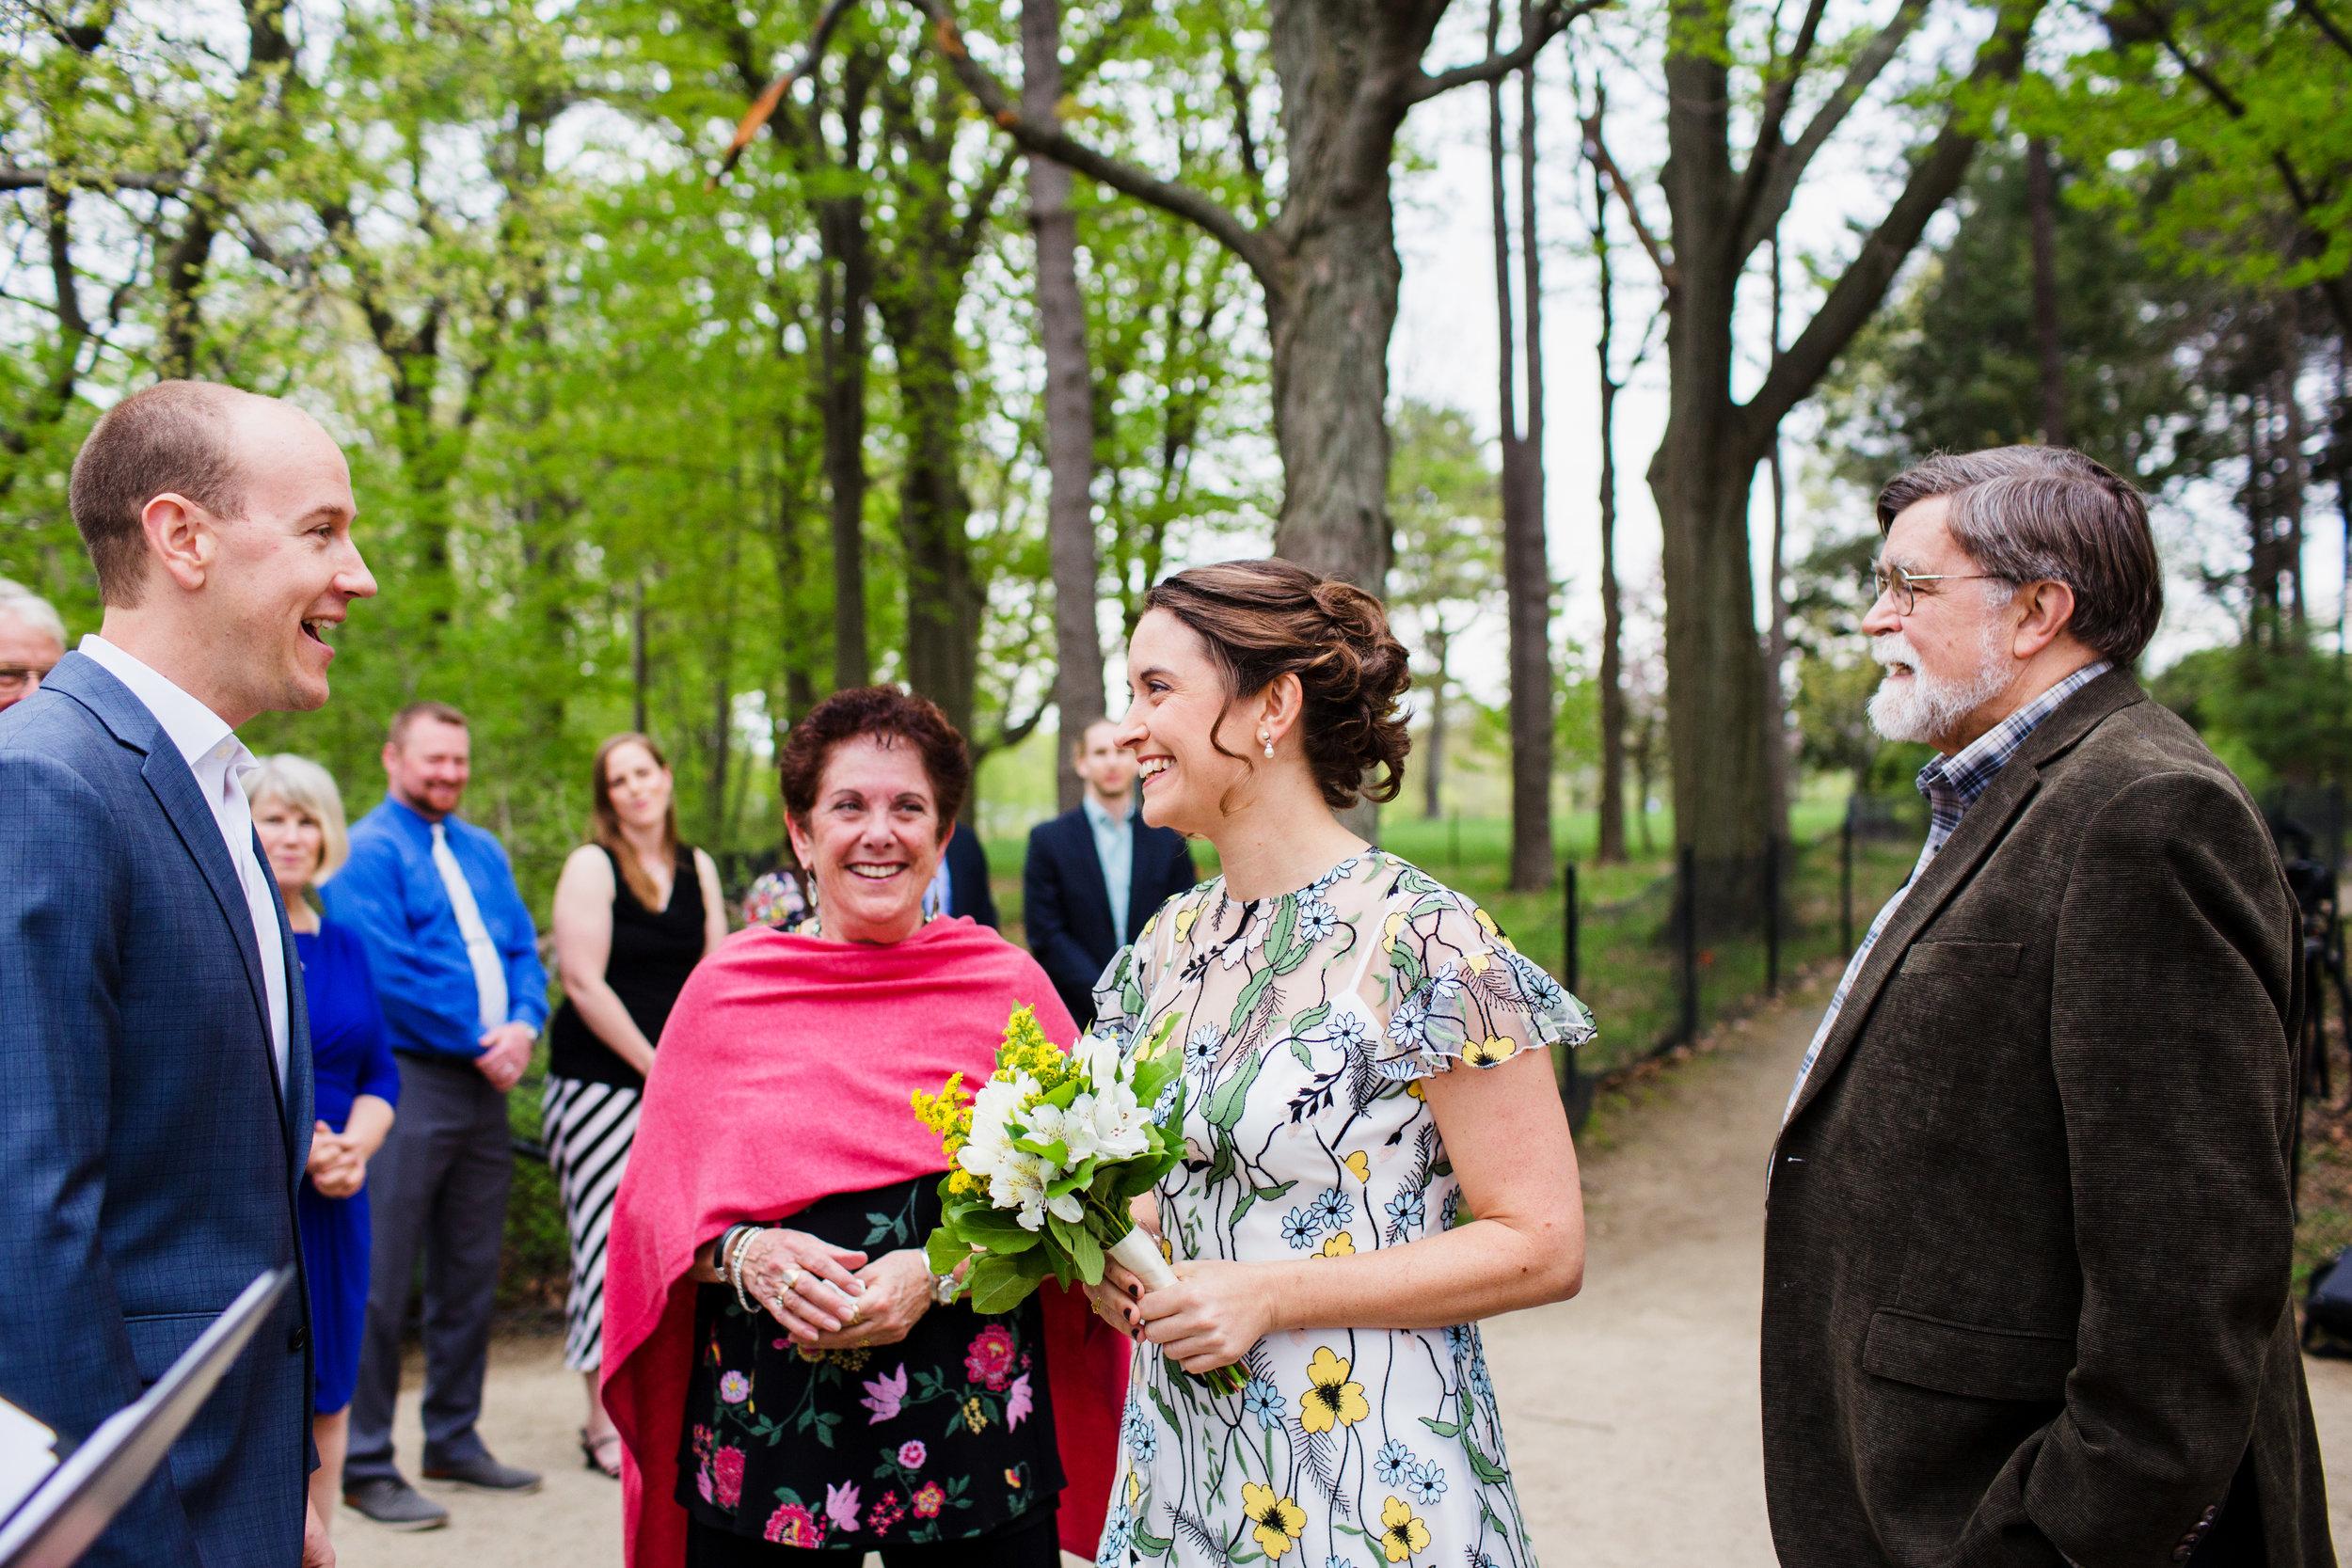 Fresh-pond-wedding-cambridge-ma-003.JPG